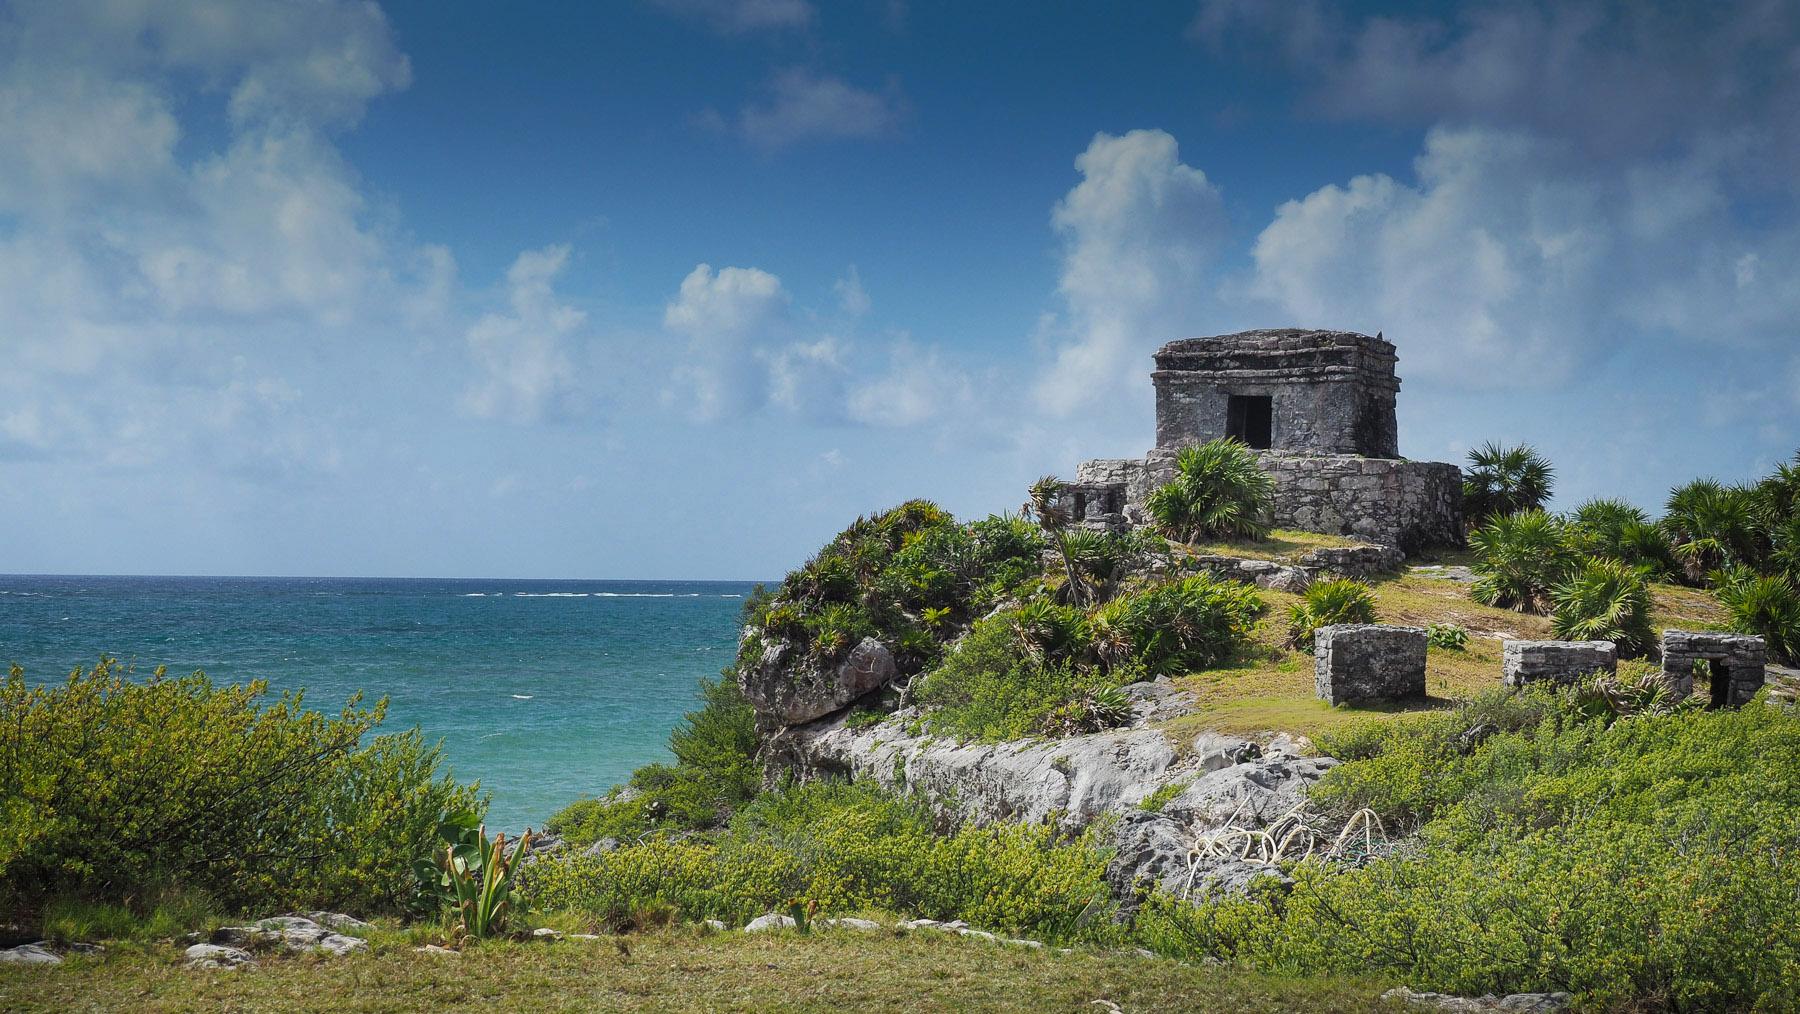 Maya-Ruinen in Tulum